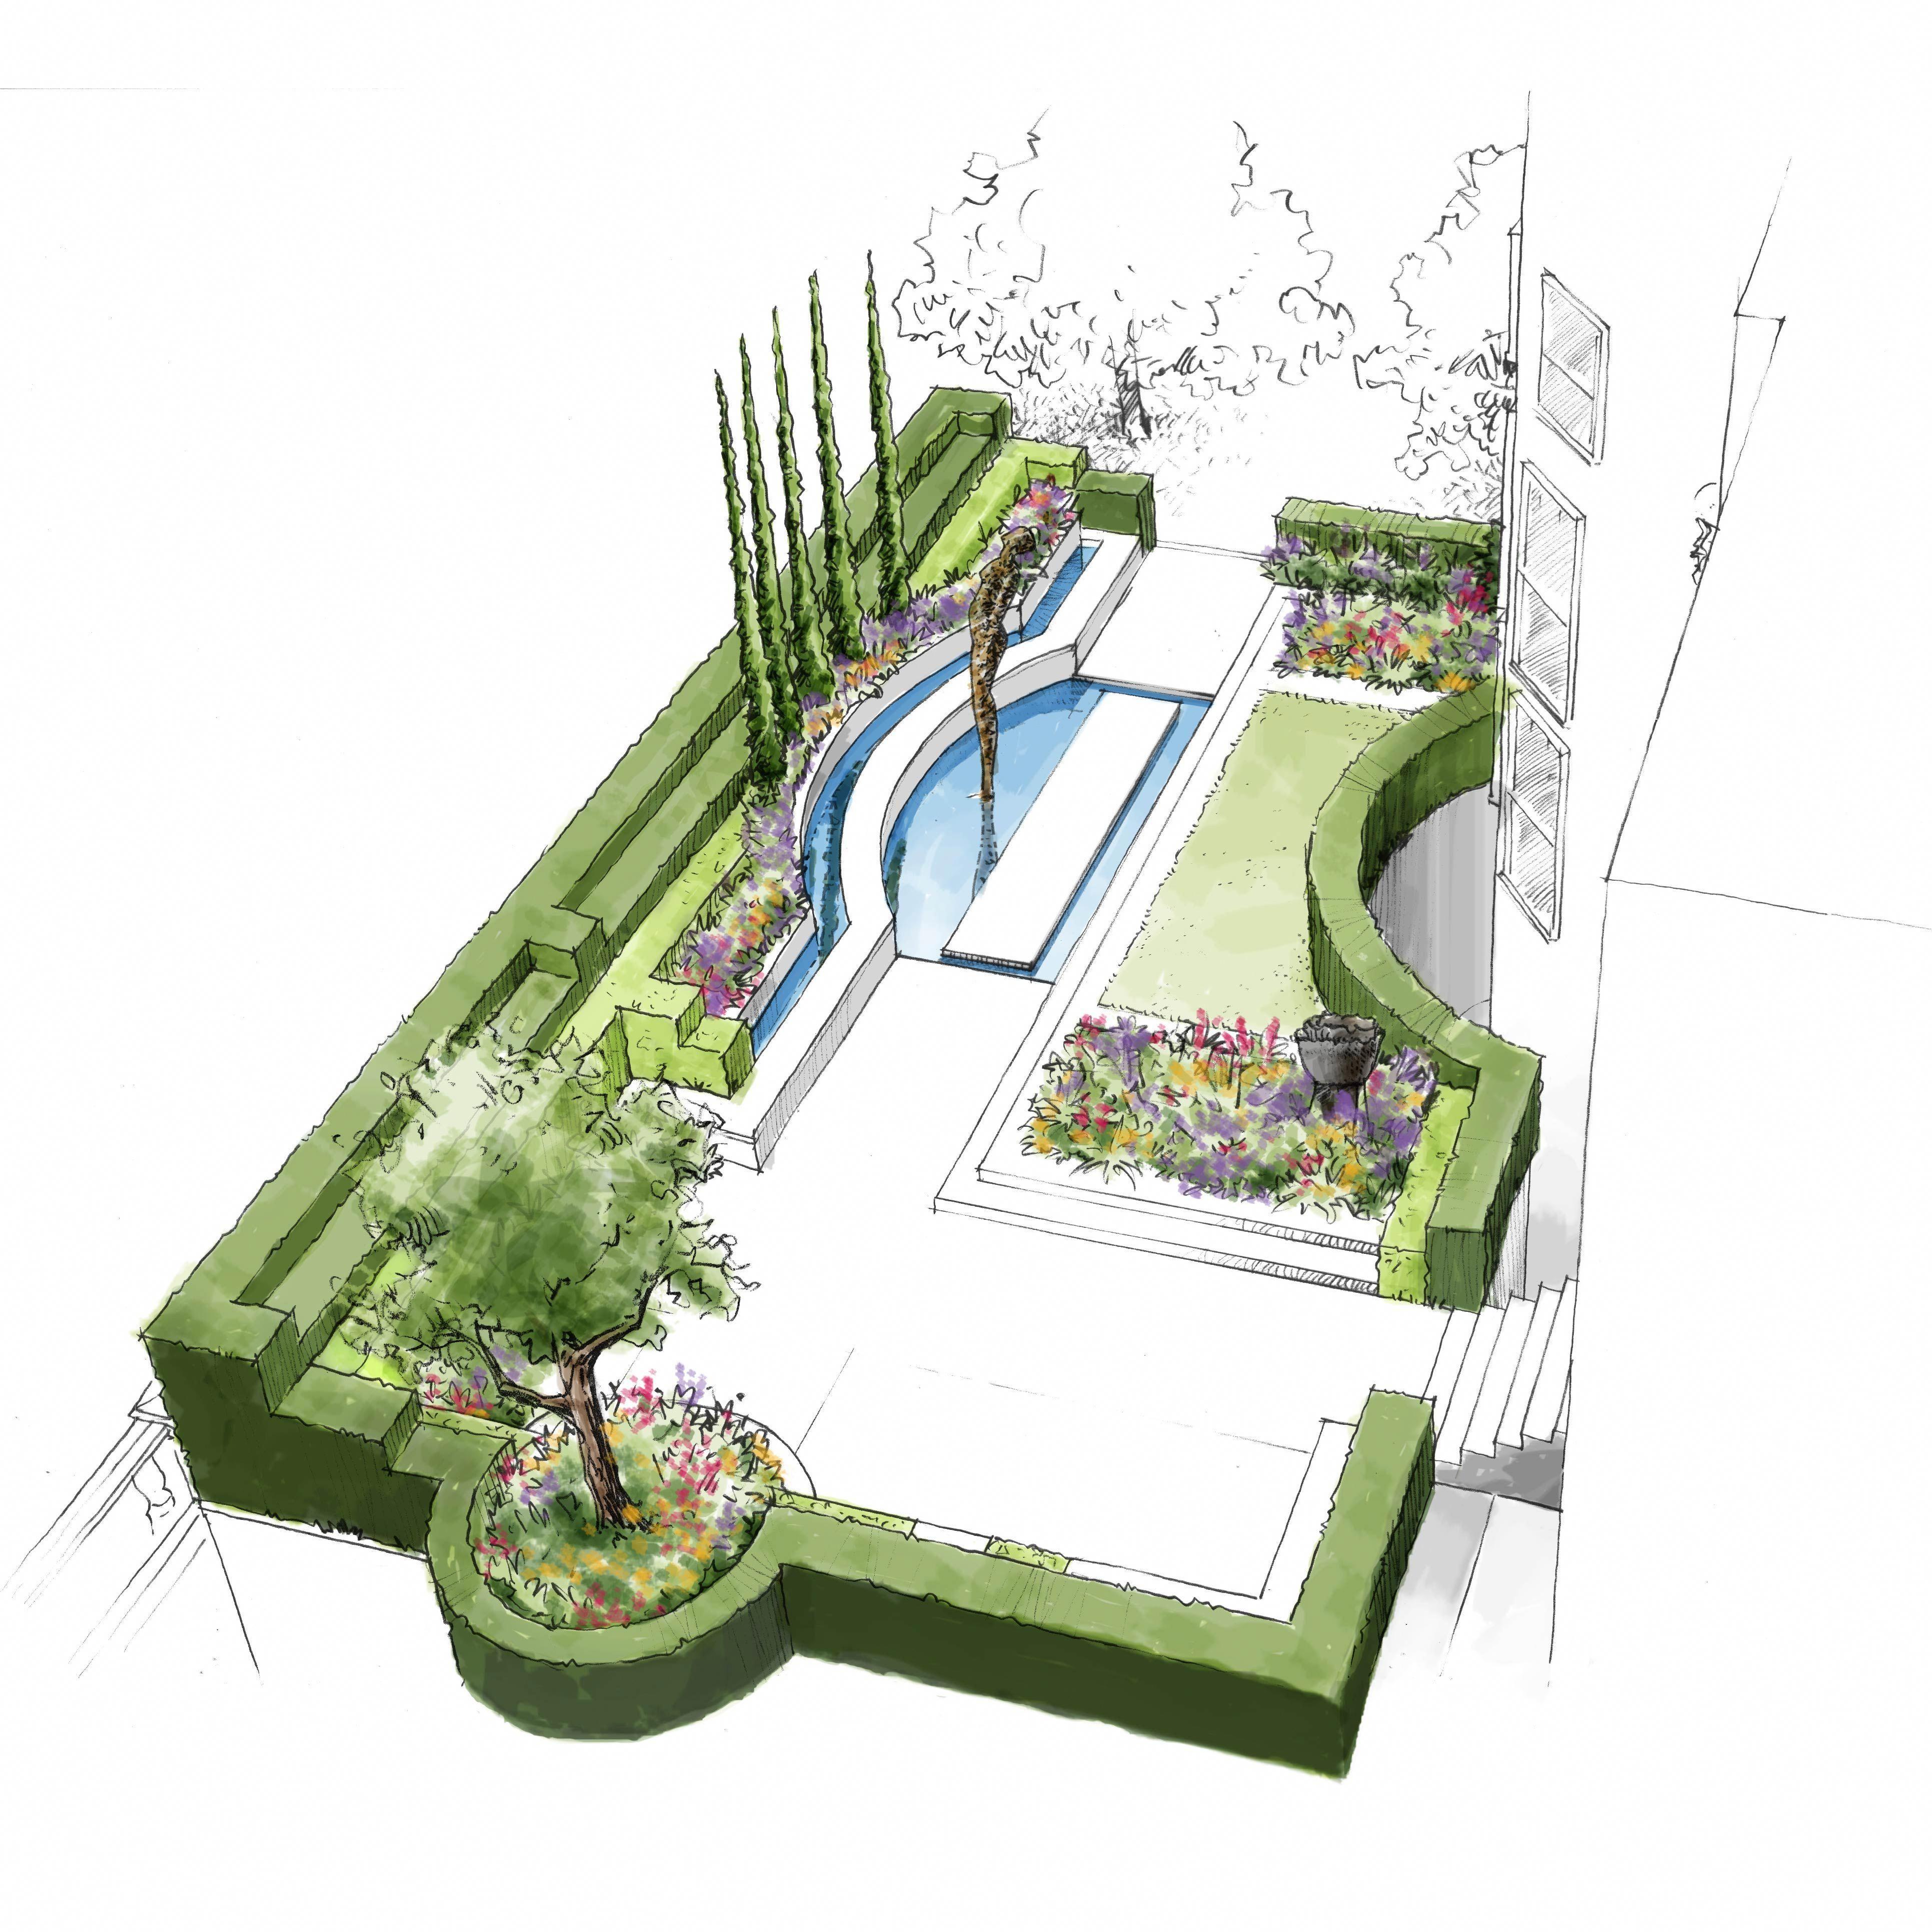 Green Roofs And Great Savings Garden Design Plans Diy Garden Projects Garden Planning